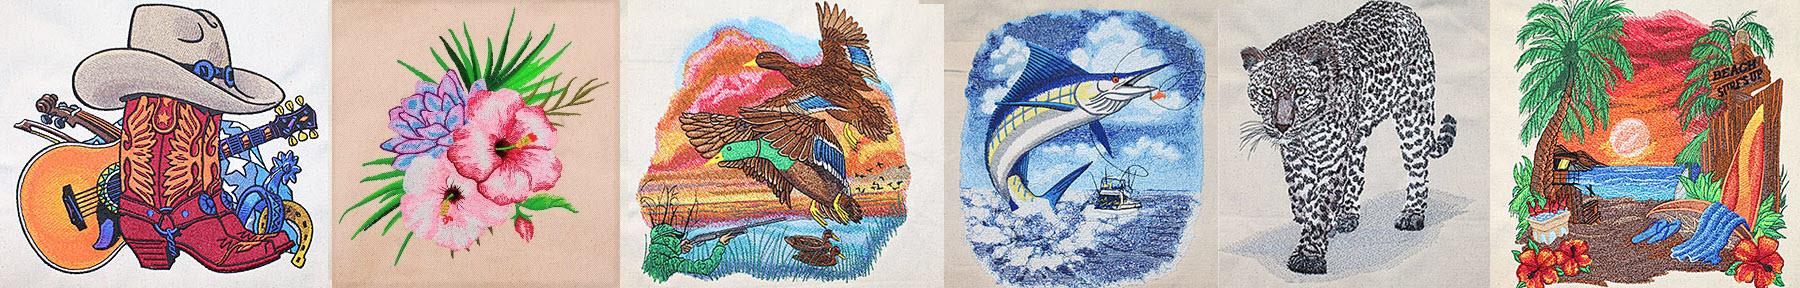 Premium Embroidery Designs Banner